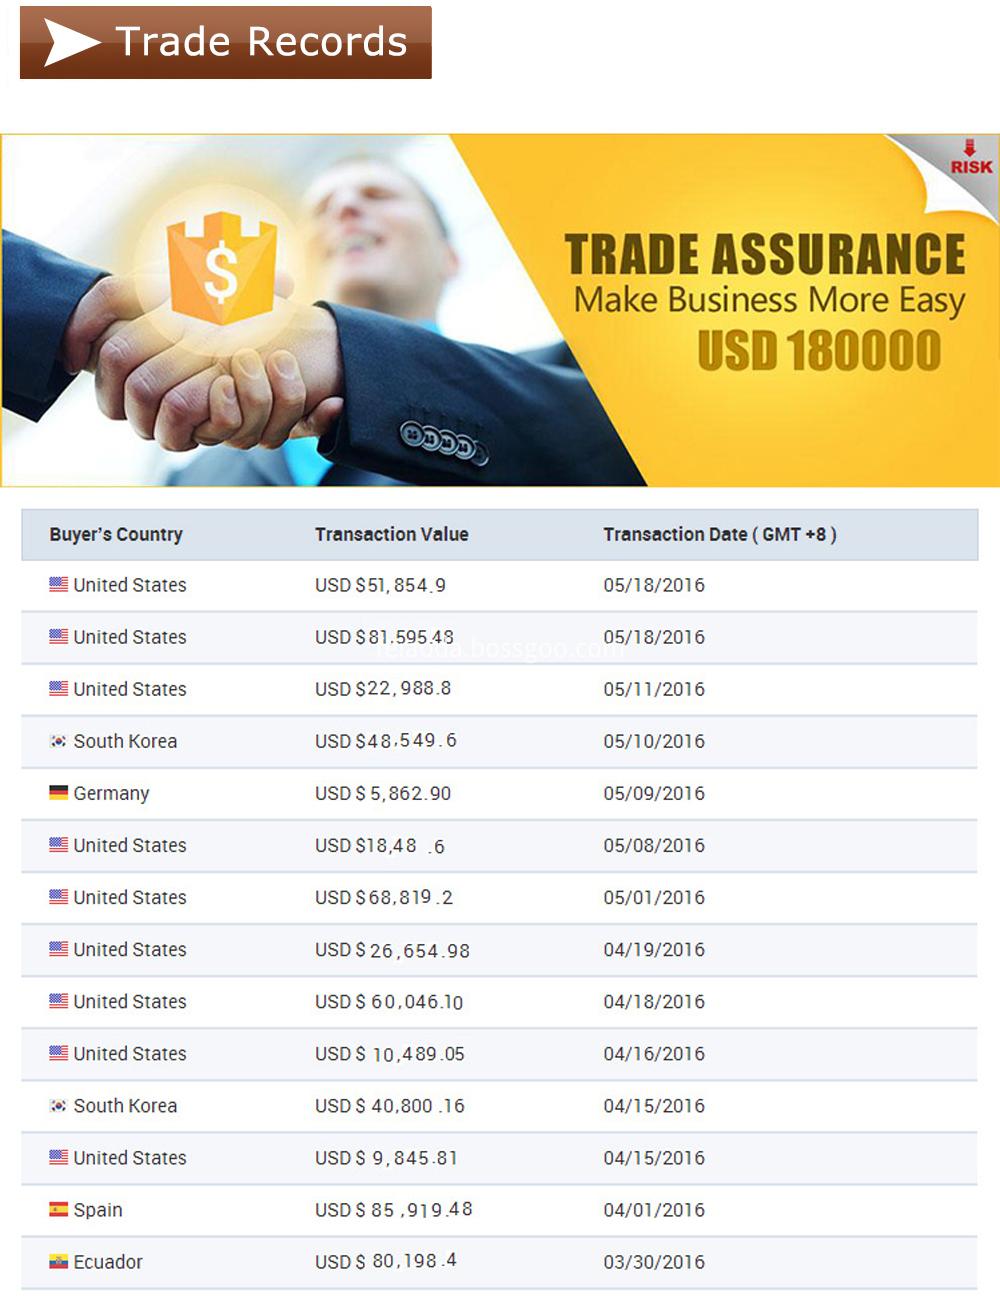 Trade arrurance